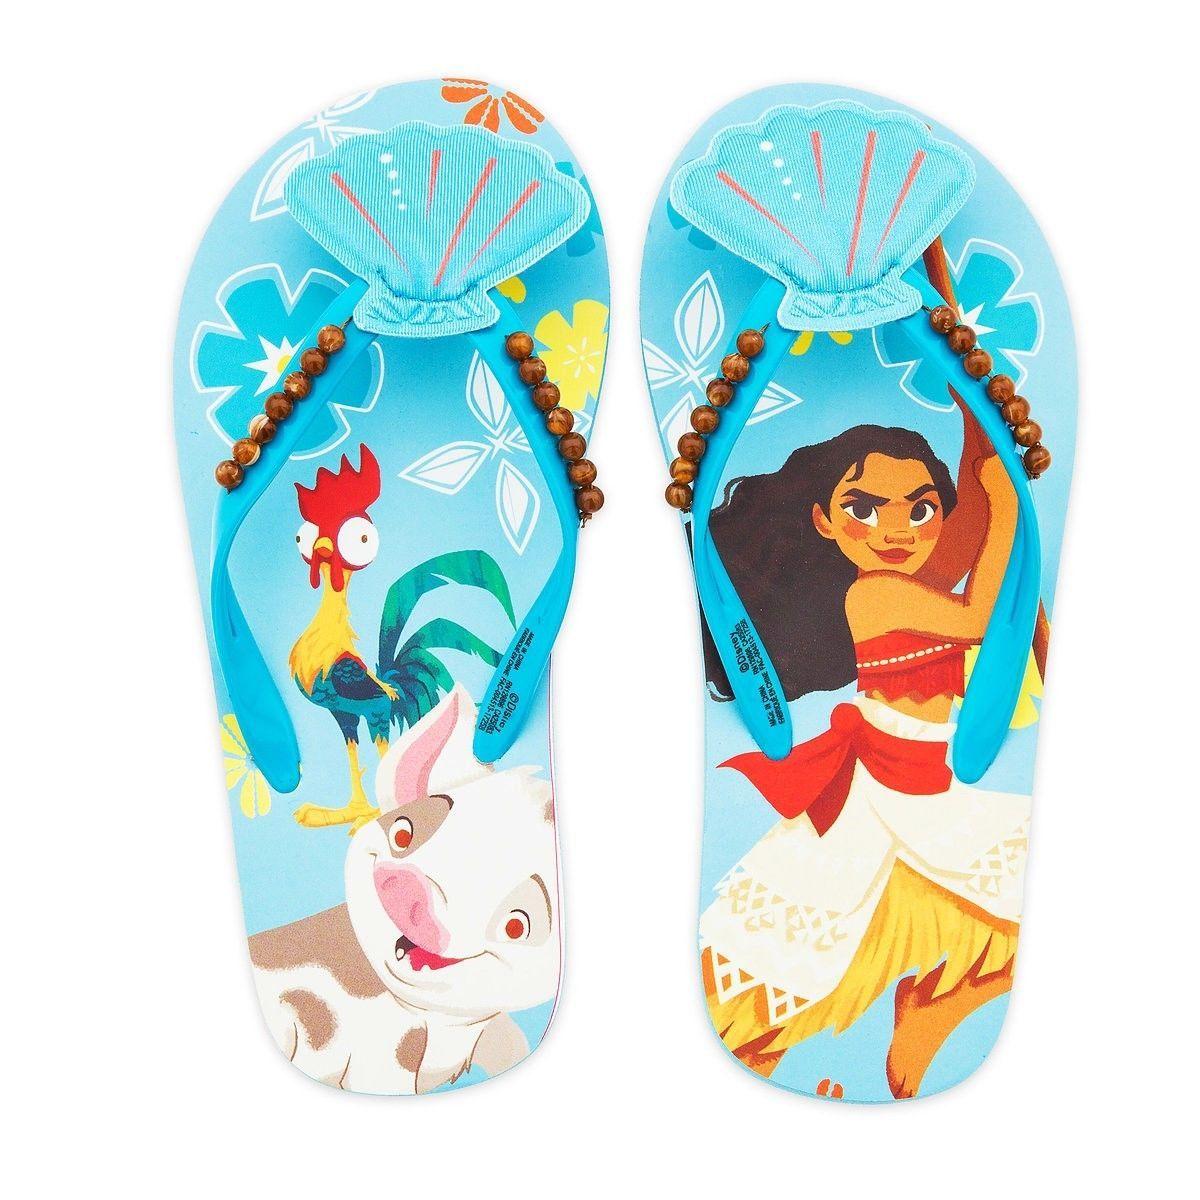 MOANA DISNEY PRINCESS Girls Flip Flops Beach Sandals w/ Optional Sunglasses NWT